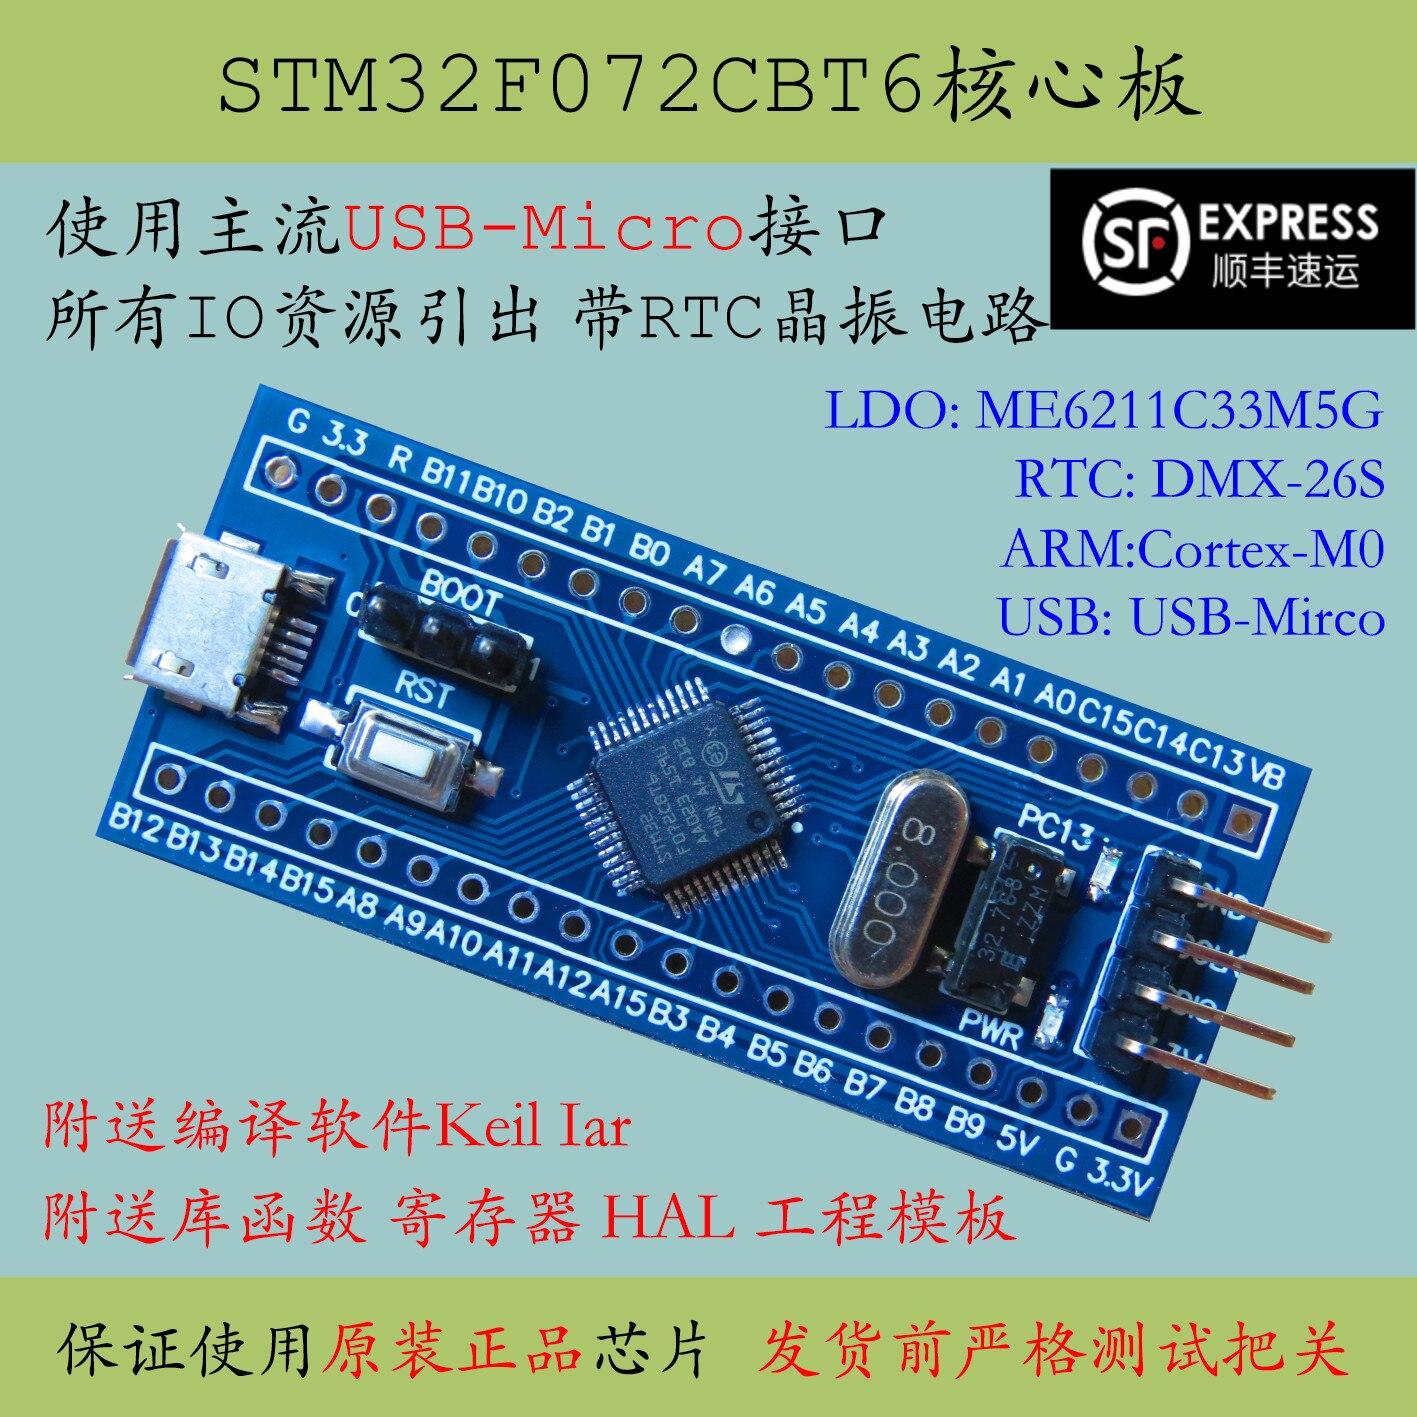 Stm32f072 Core Board Stm32f072cbt6 New Minimum System Cortex-M0 Promotion Development Board